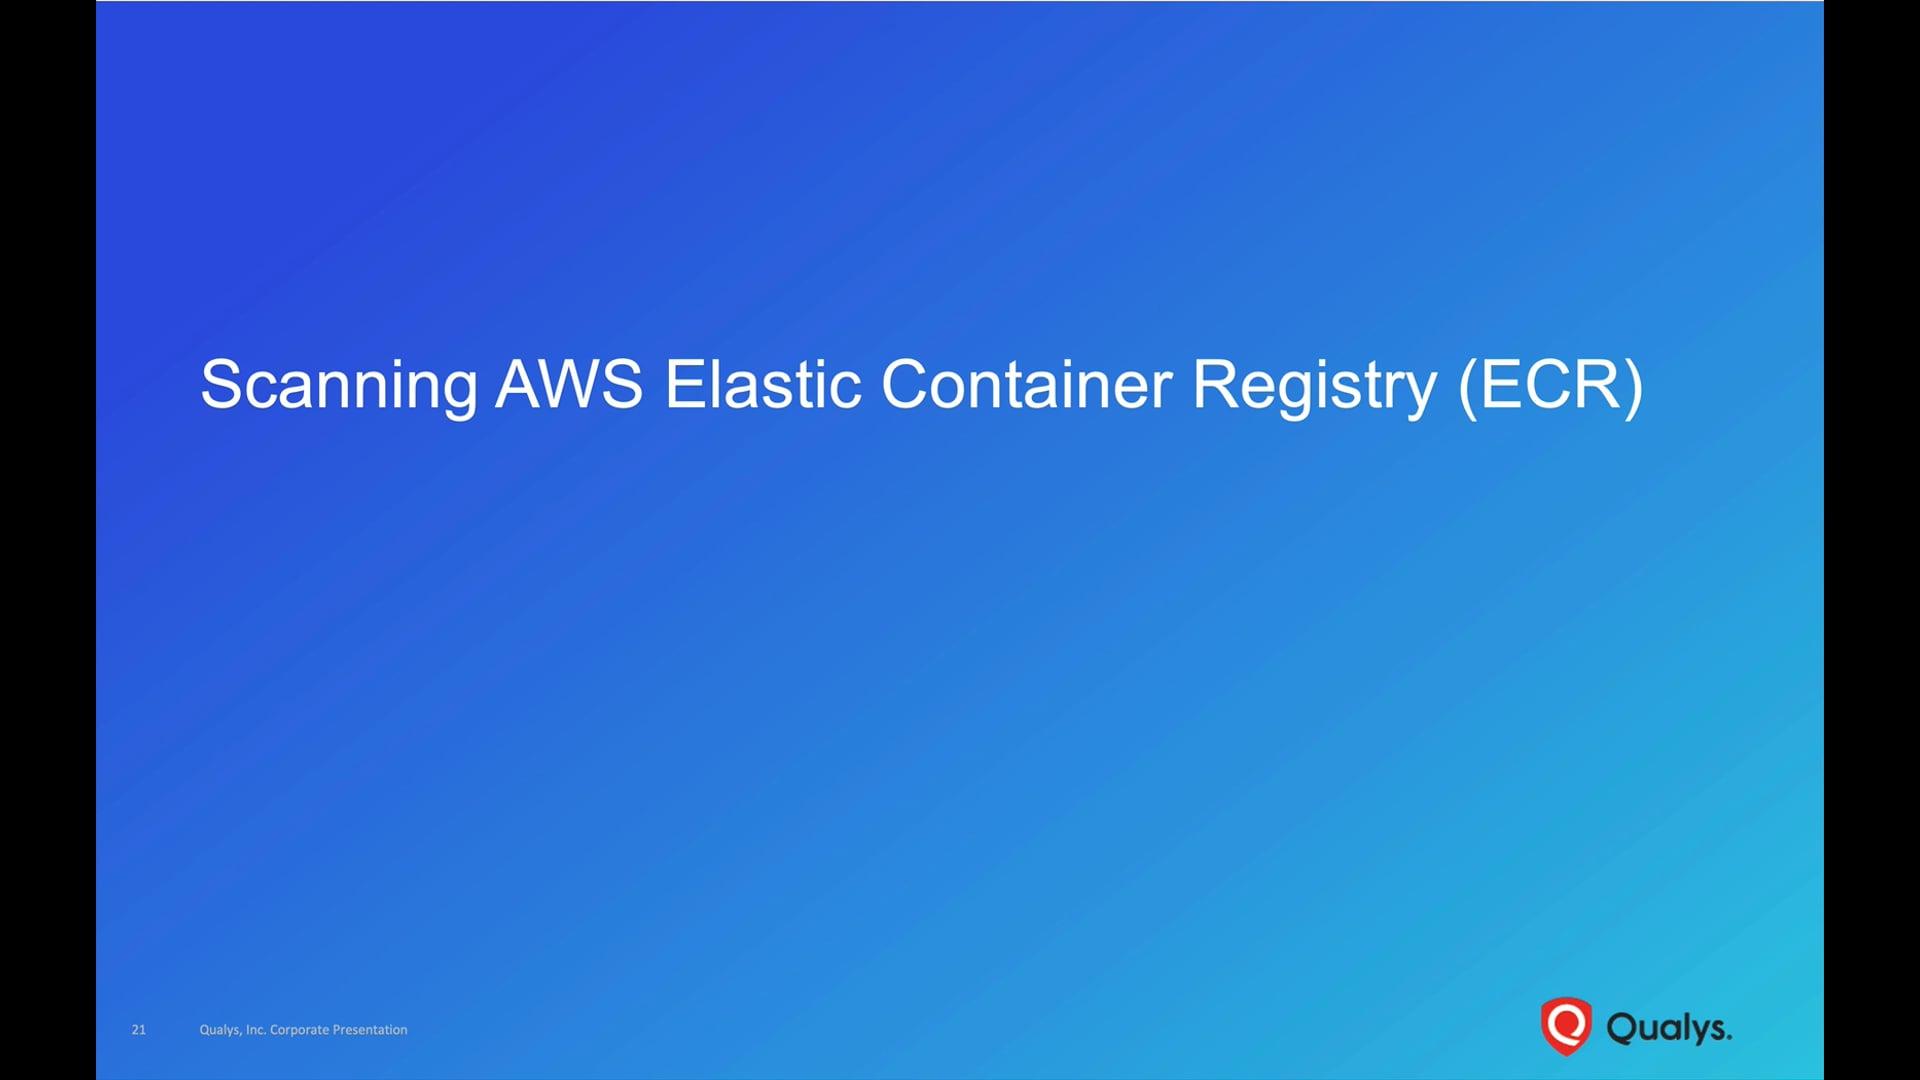 Scanning AWS Elastic Container Registry (ECR)